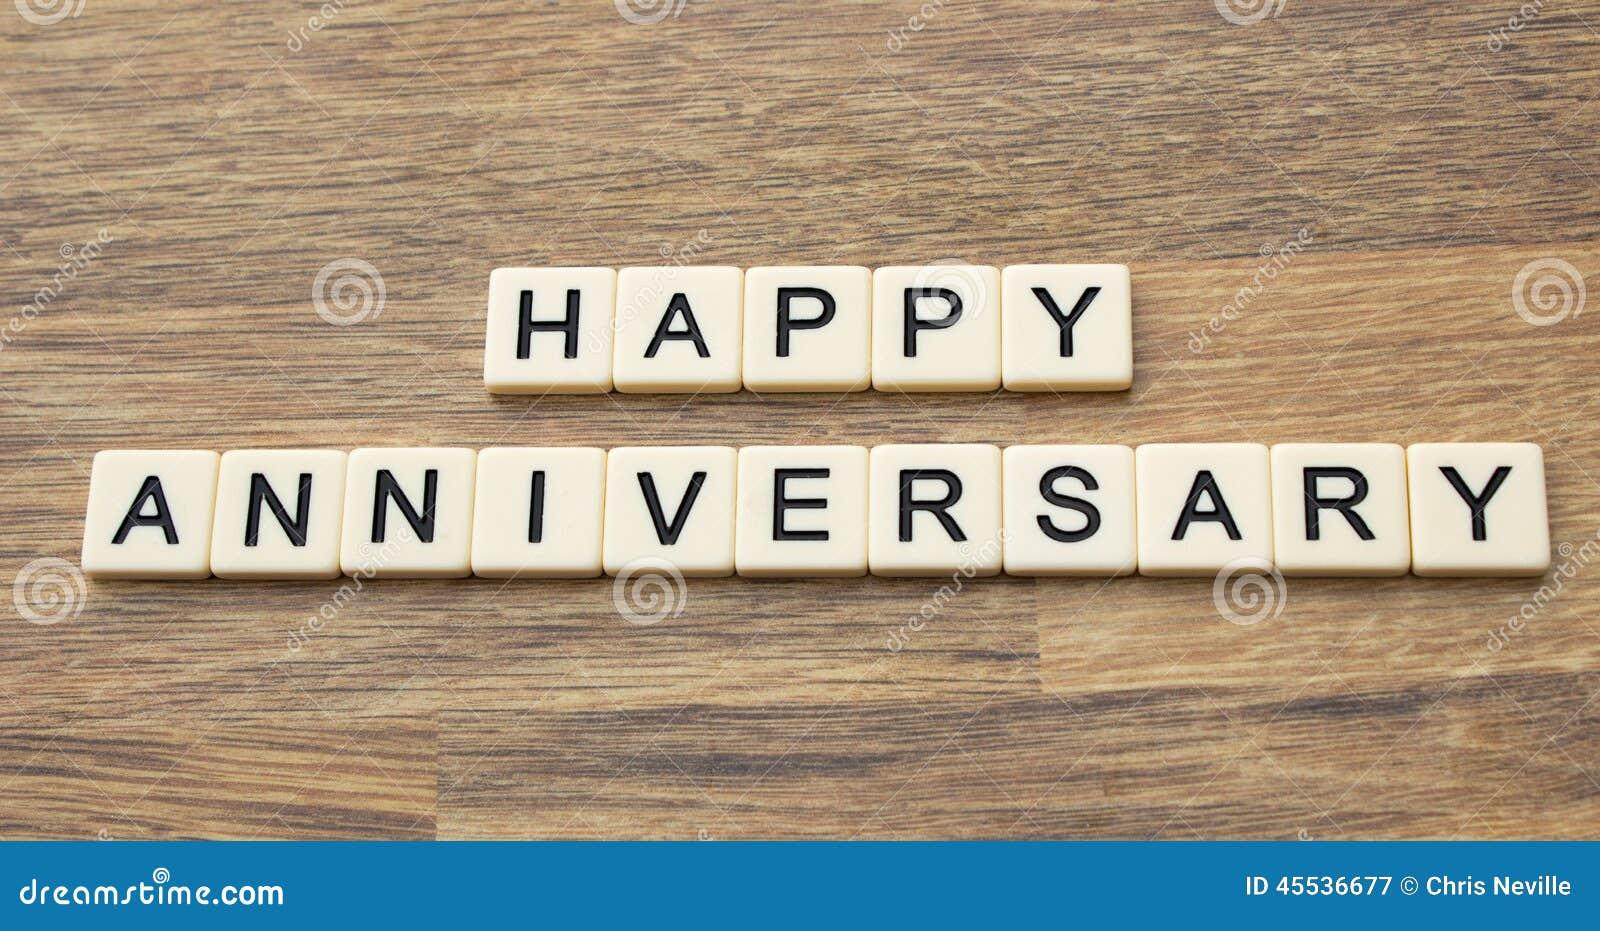 Happy Anniversary Stock Photo